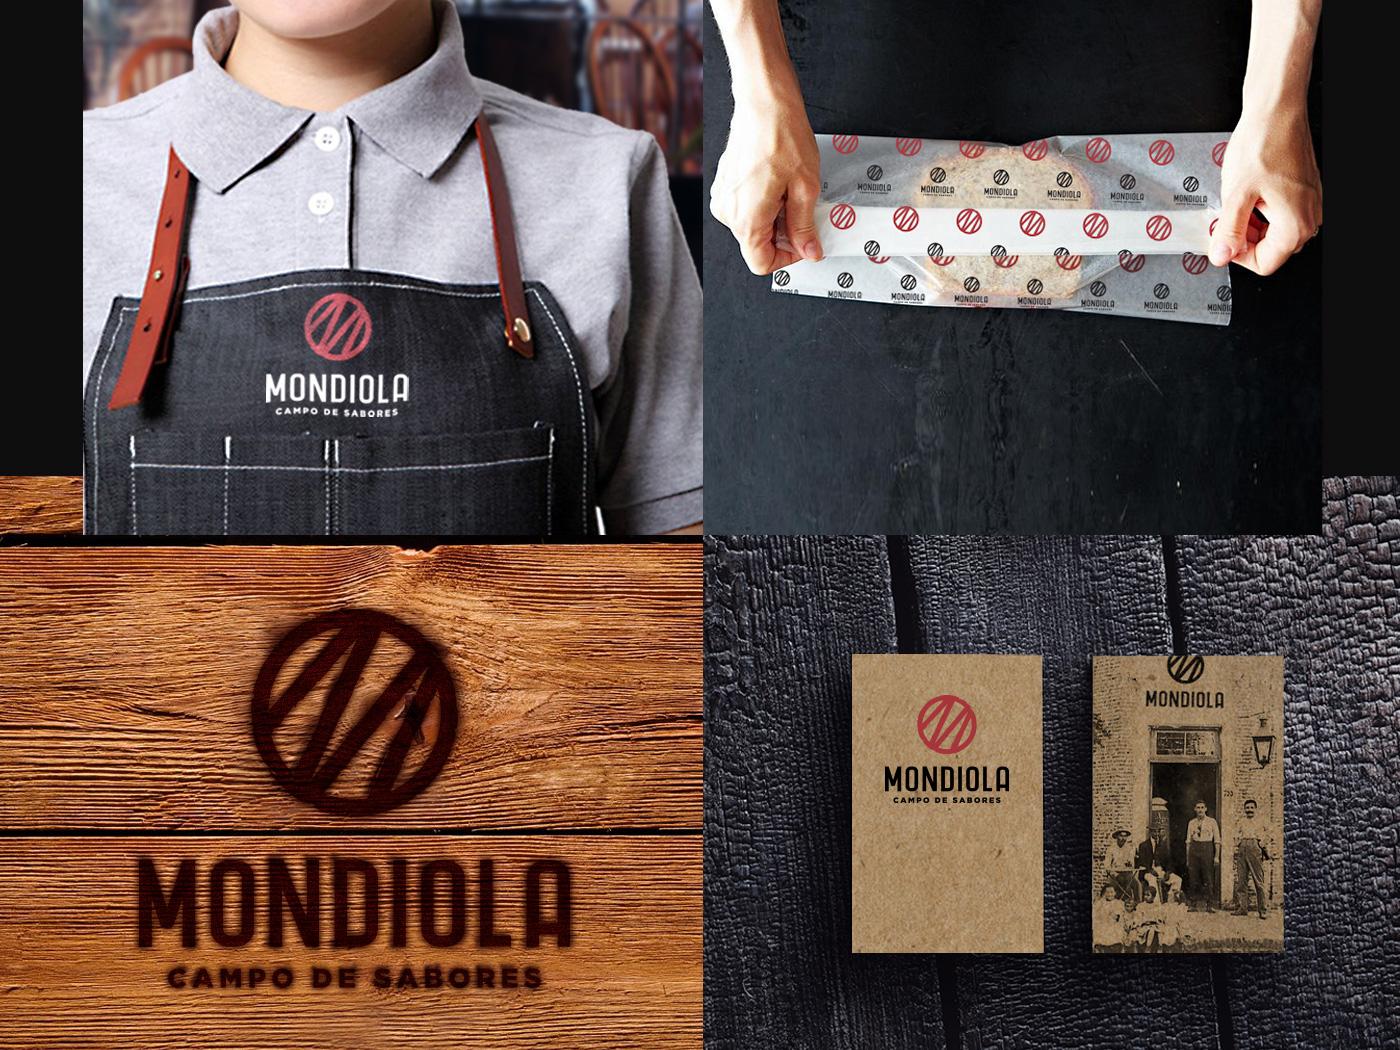 Mondiola | Branding monogram asado graphic design food truck restaurant logo illustration identity design brand strategy branding